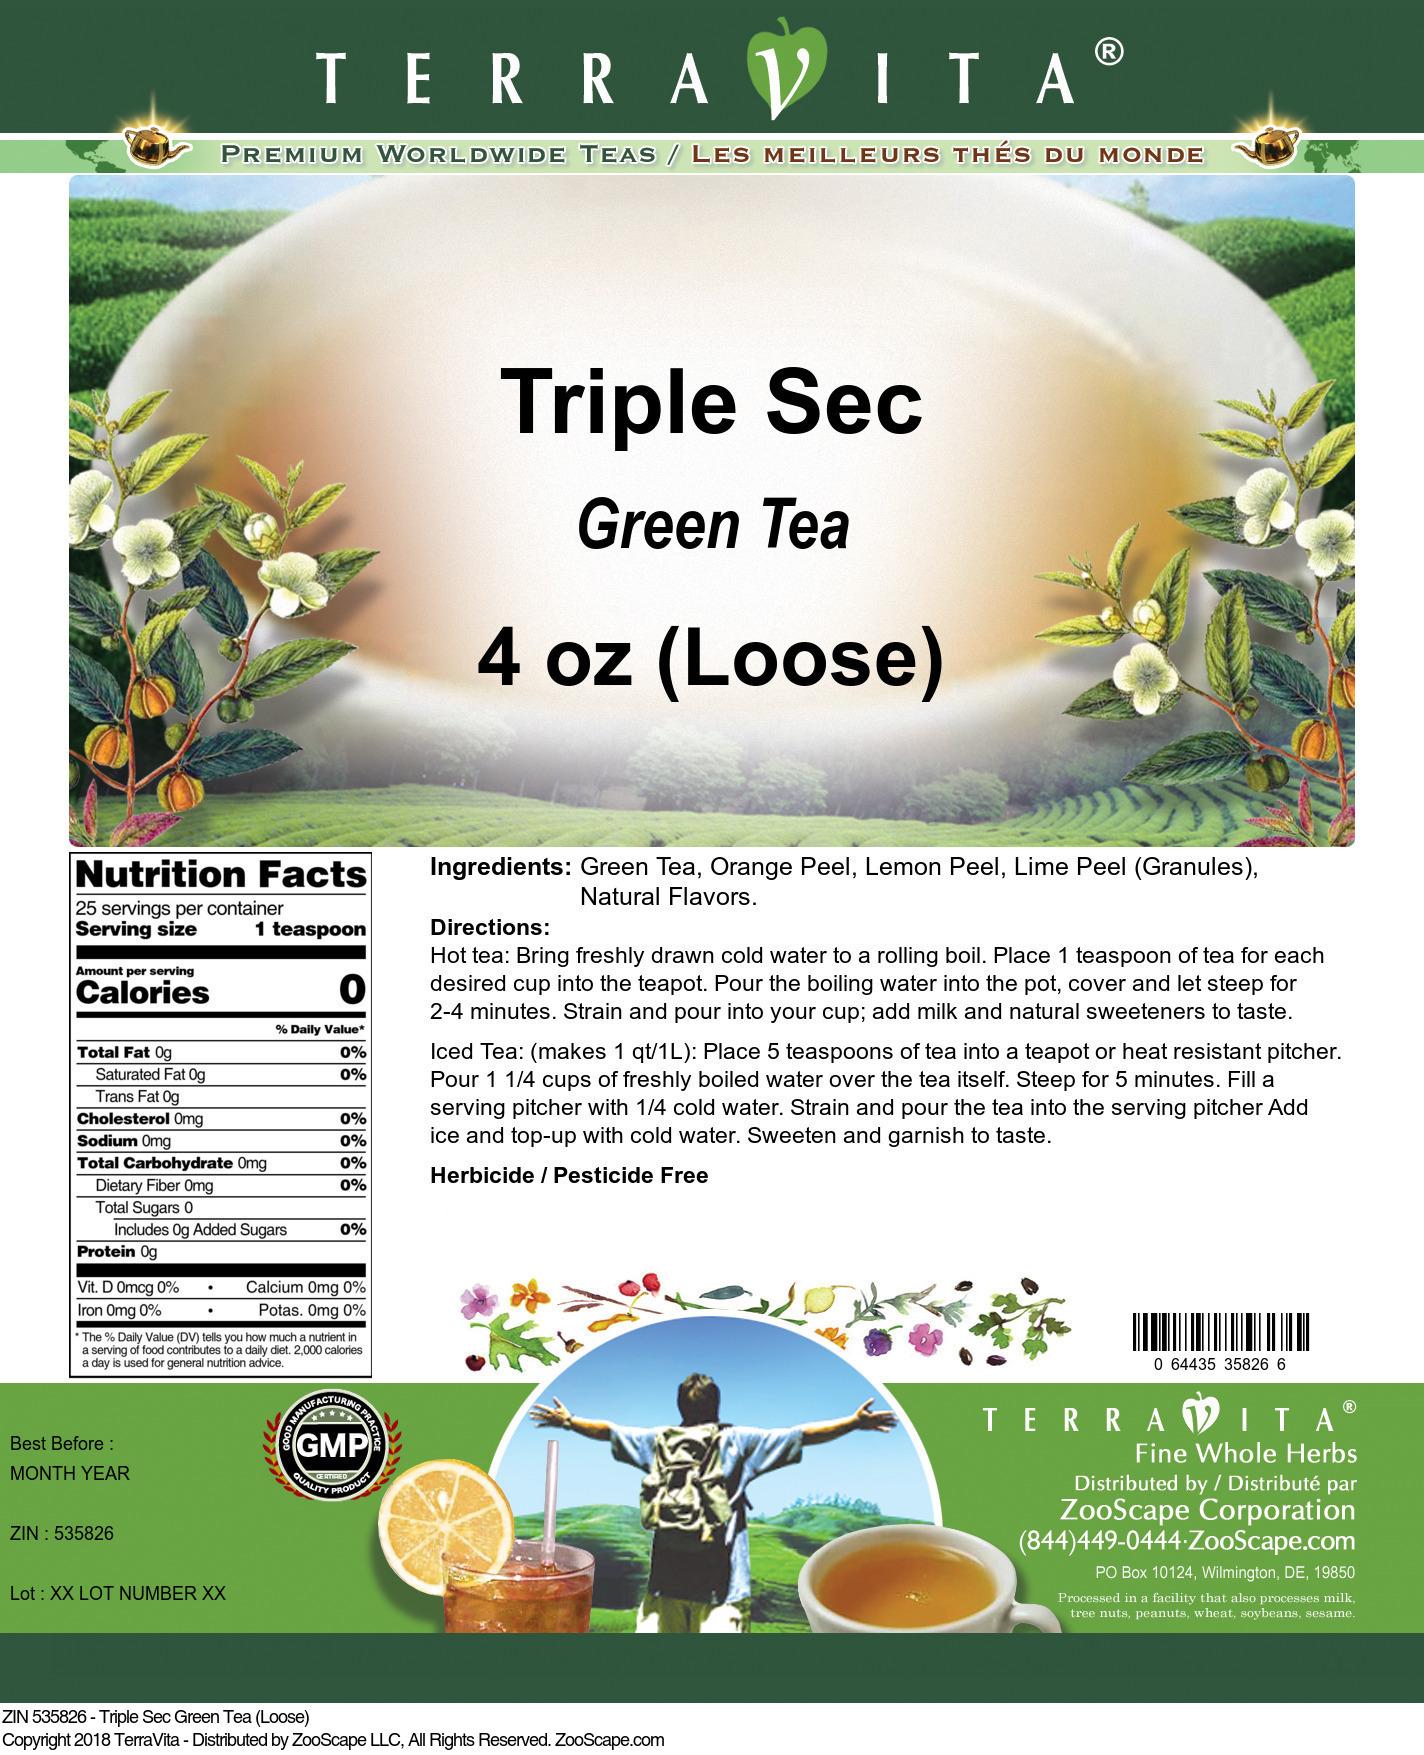 Triple Sec Green Tea (Loose)